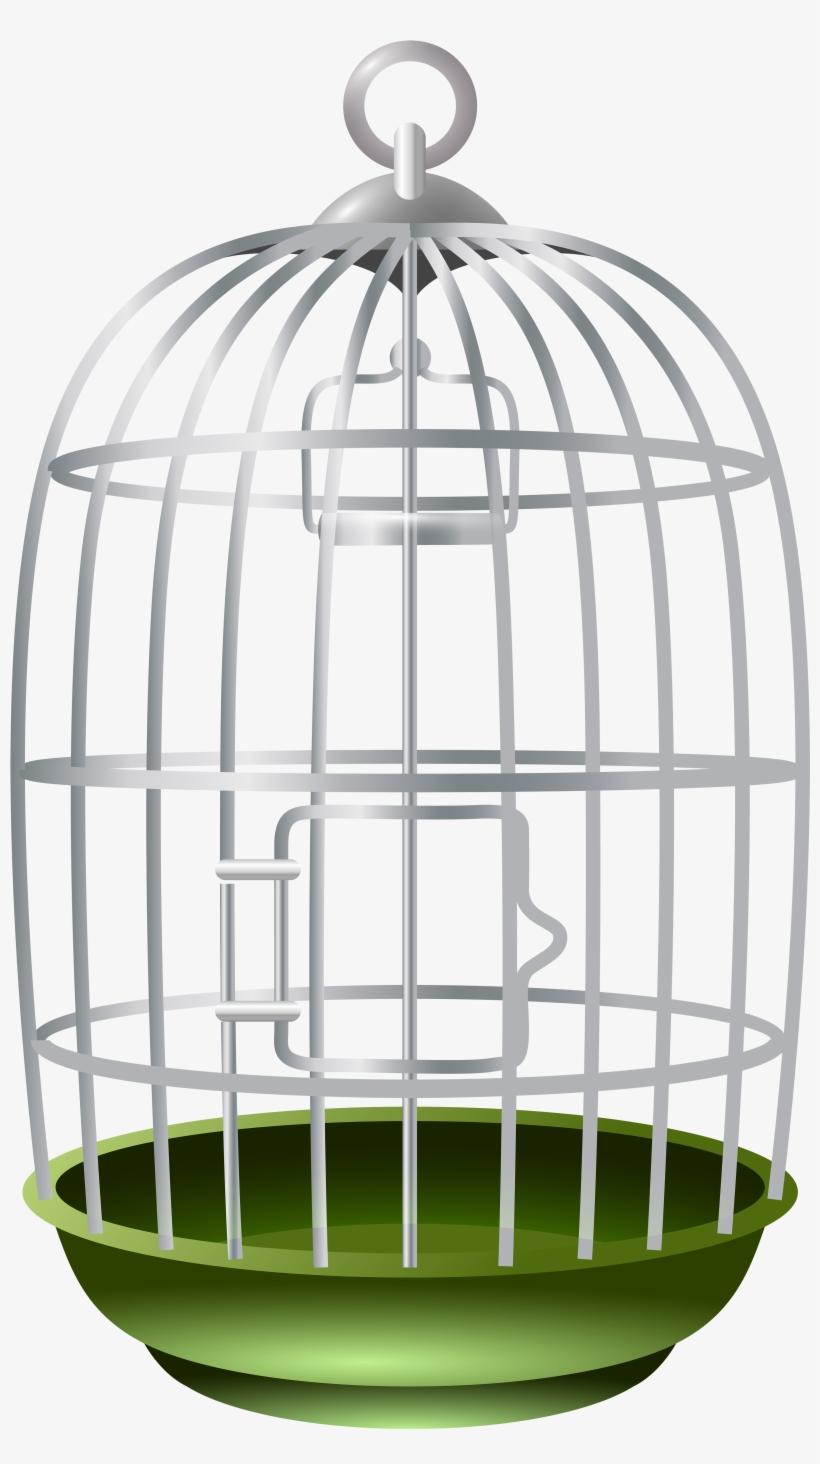 Birdcage png clip art. Cage clipart bird's